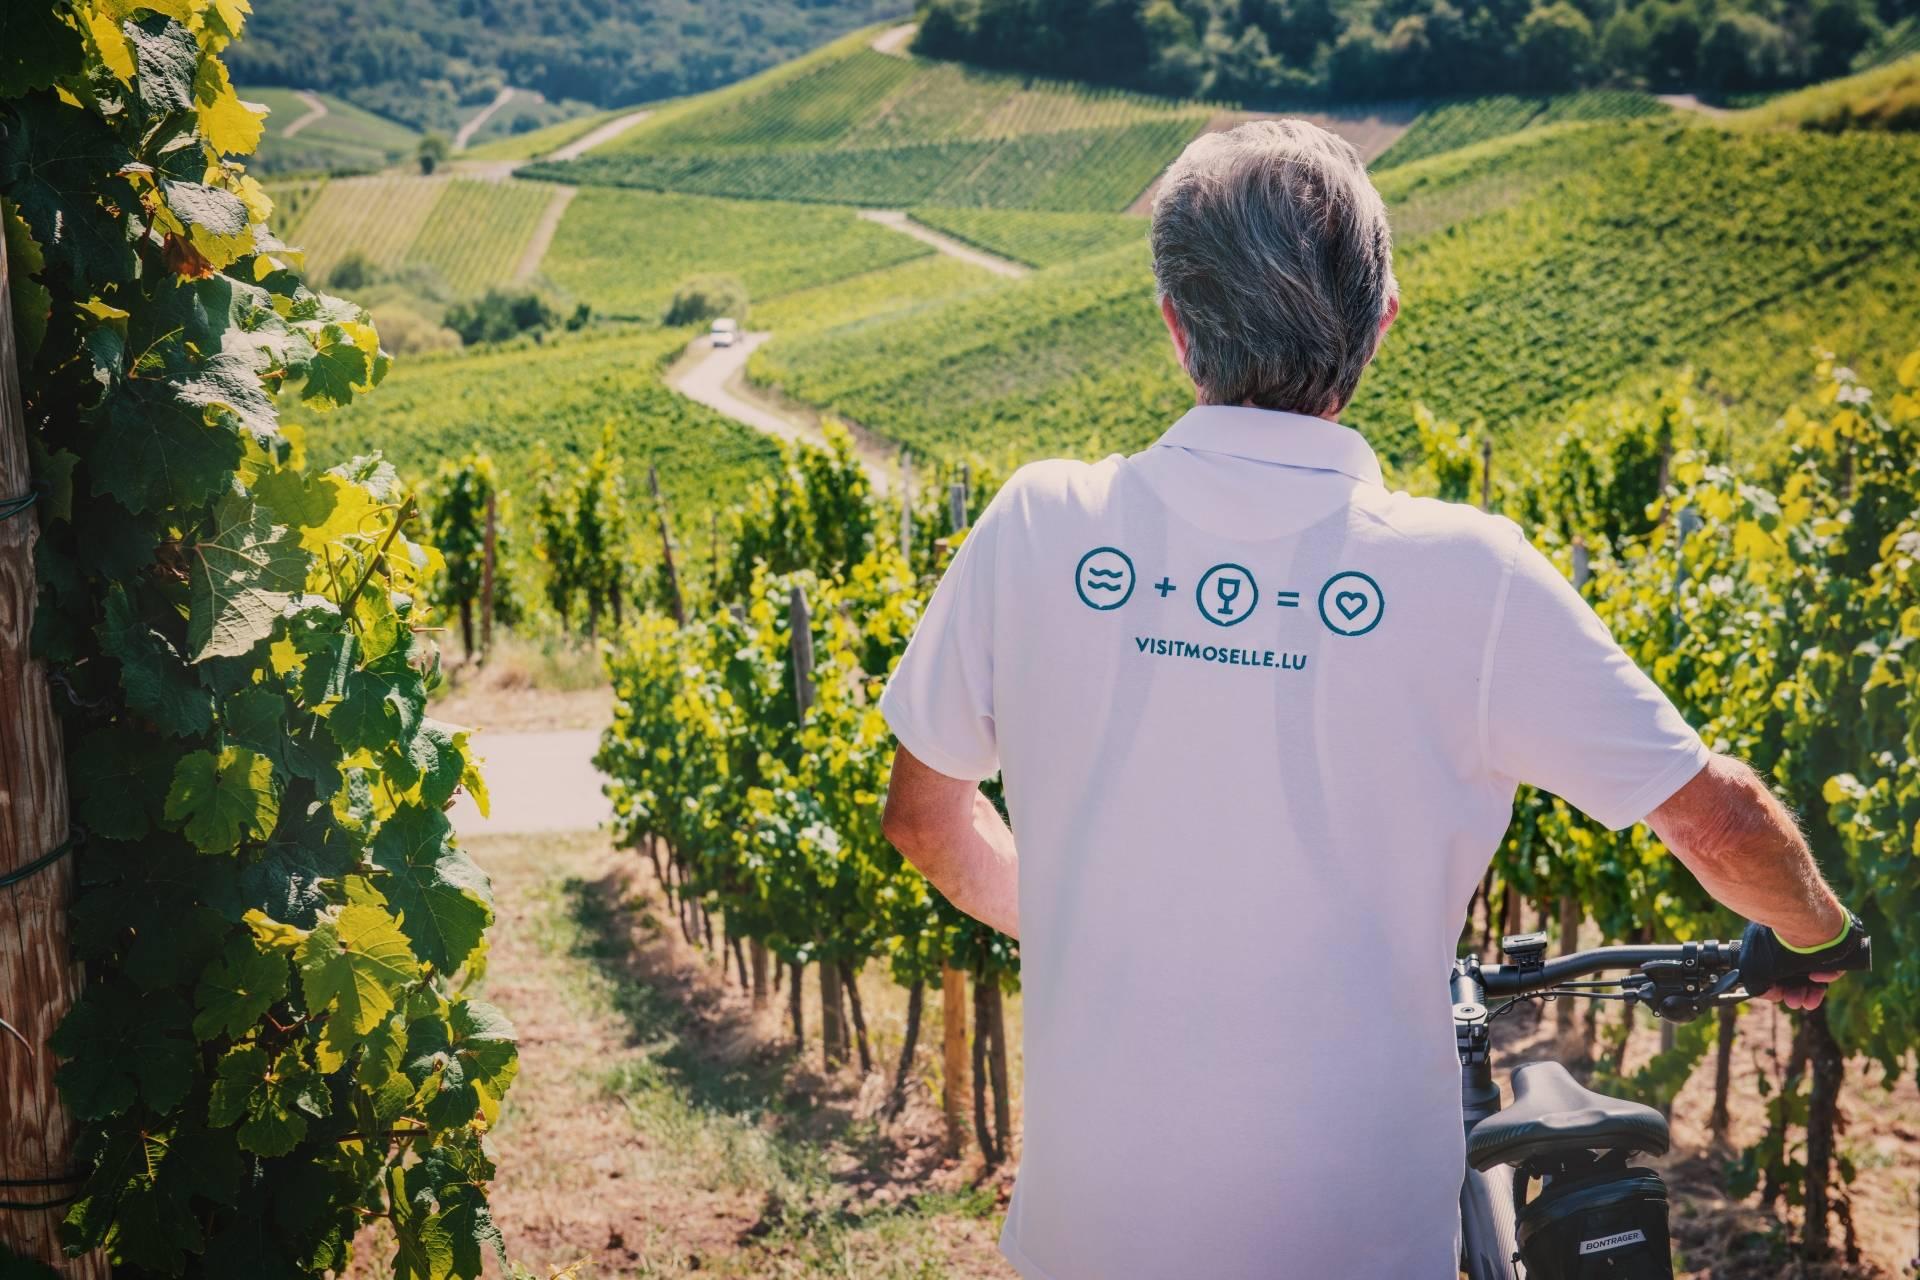 biking moselle region visit moselle luxembourg